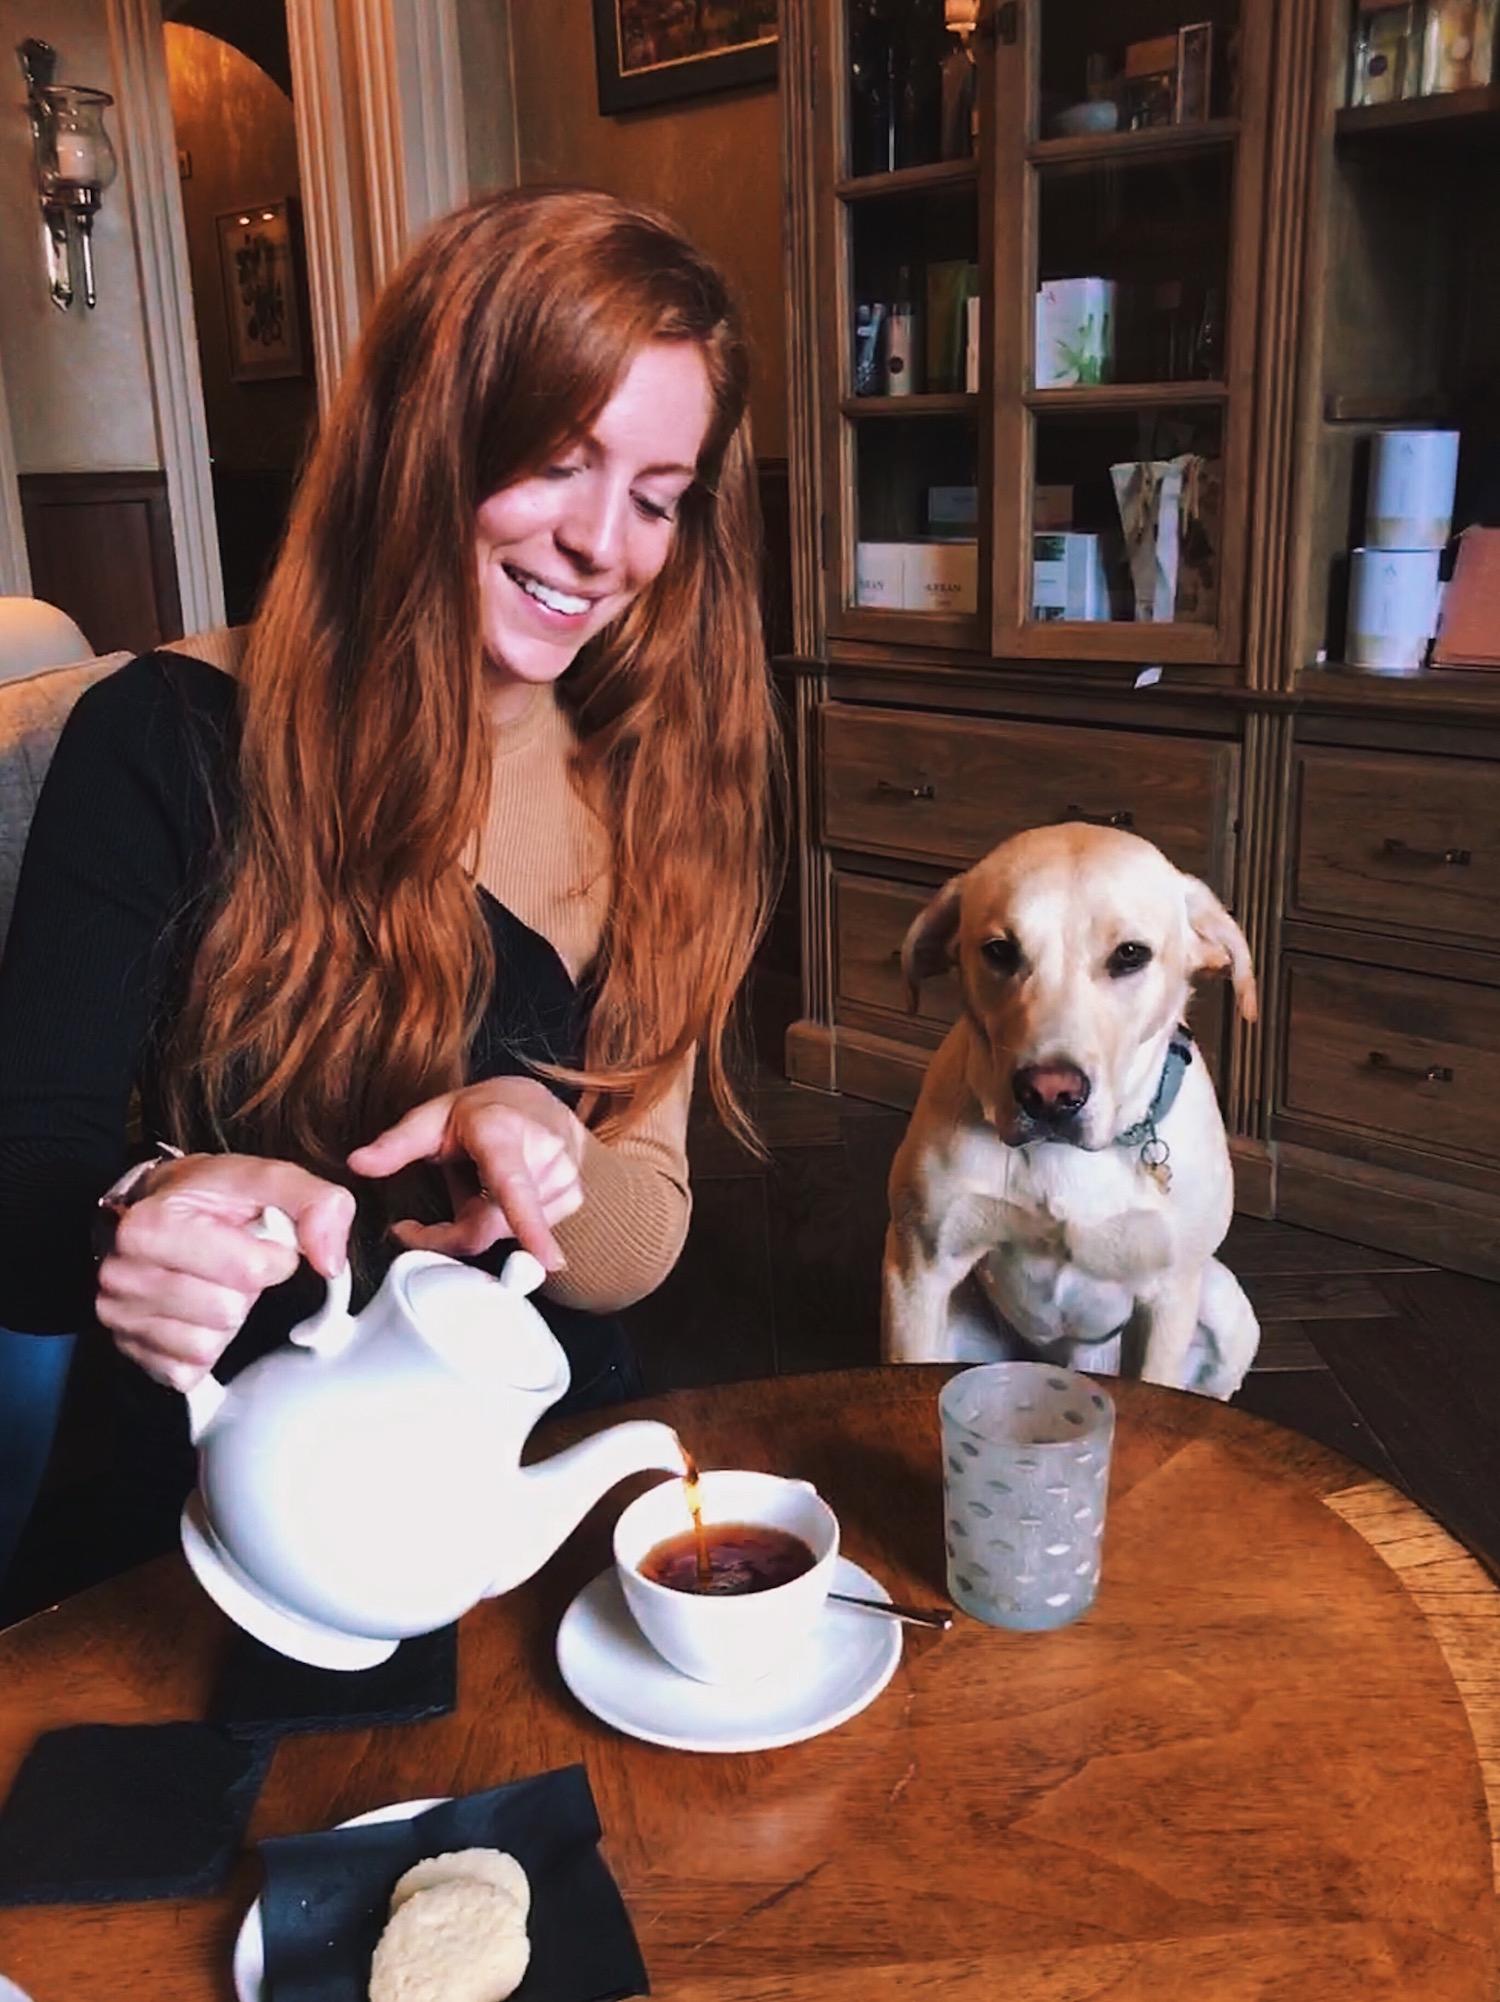 redhead-round-the-world-scotland-blogger-travel-dog-tea-afternoon.JPG